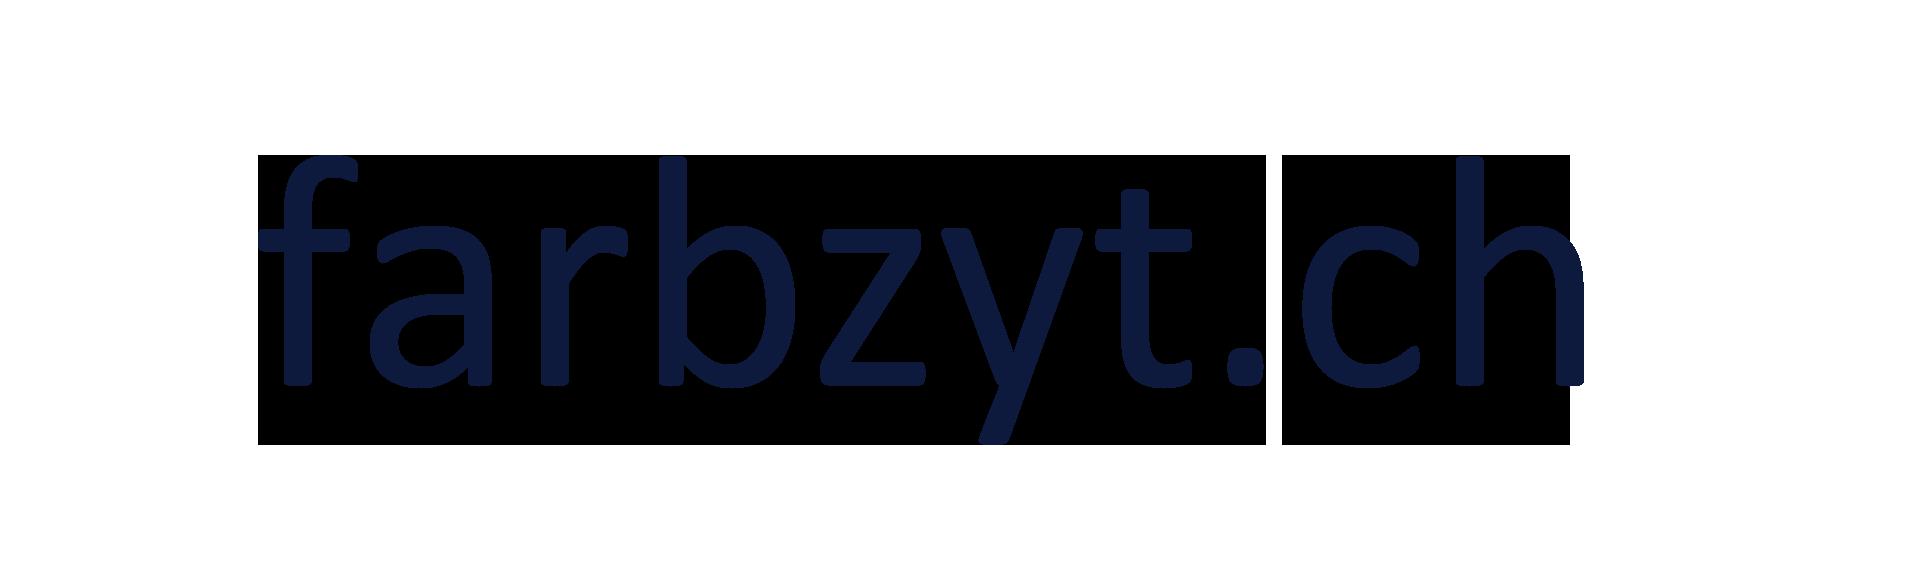 Farbzyt